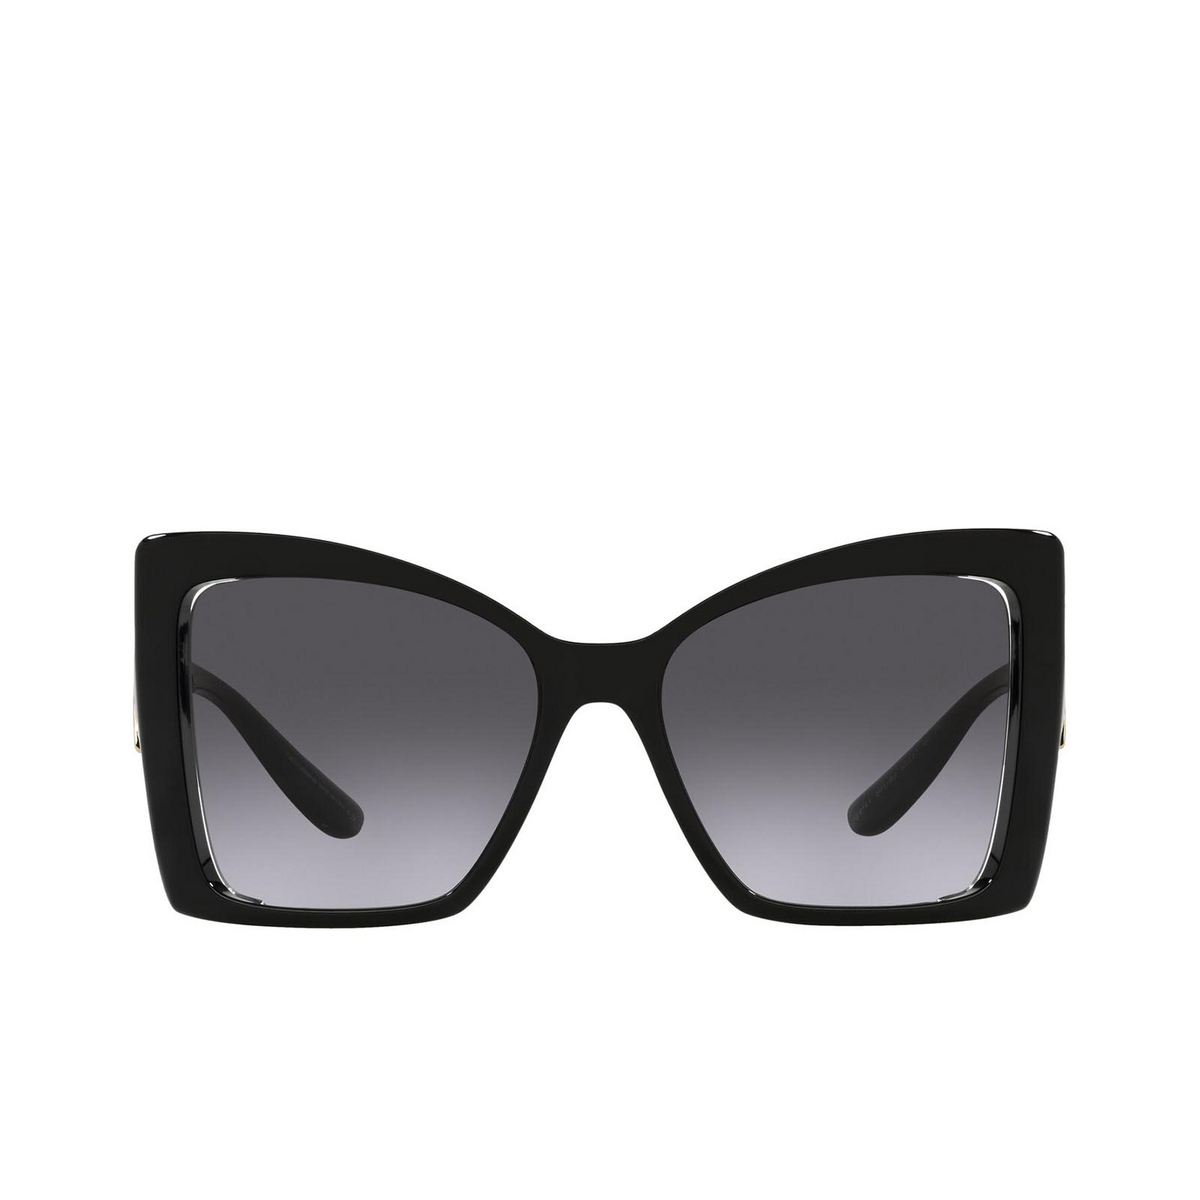 Dolce & Gabbana® Butterfly Sunglasses: DG6141 color Black 501/8G - front view.